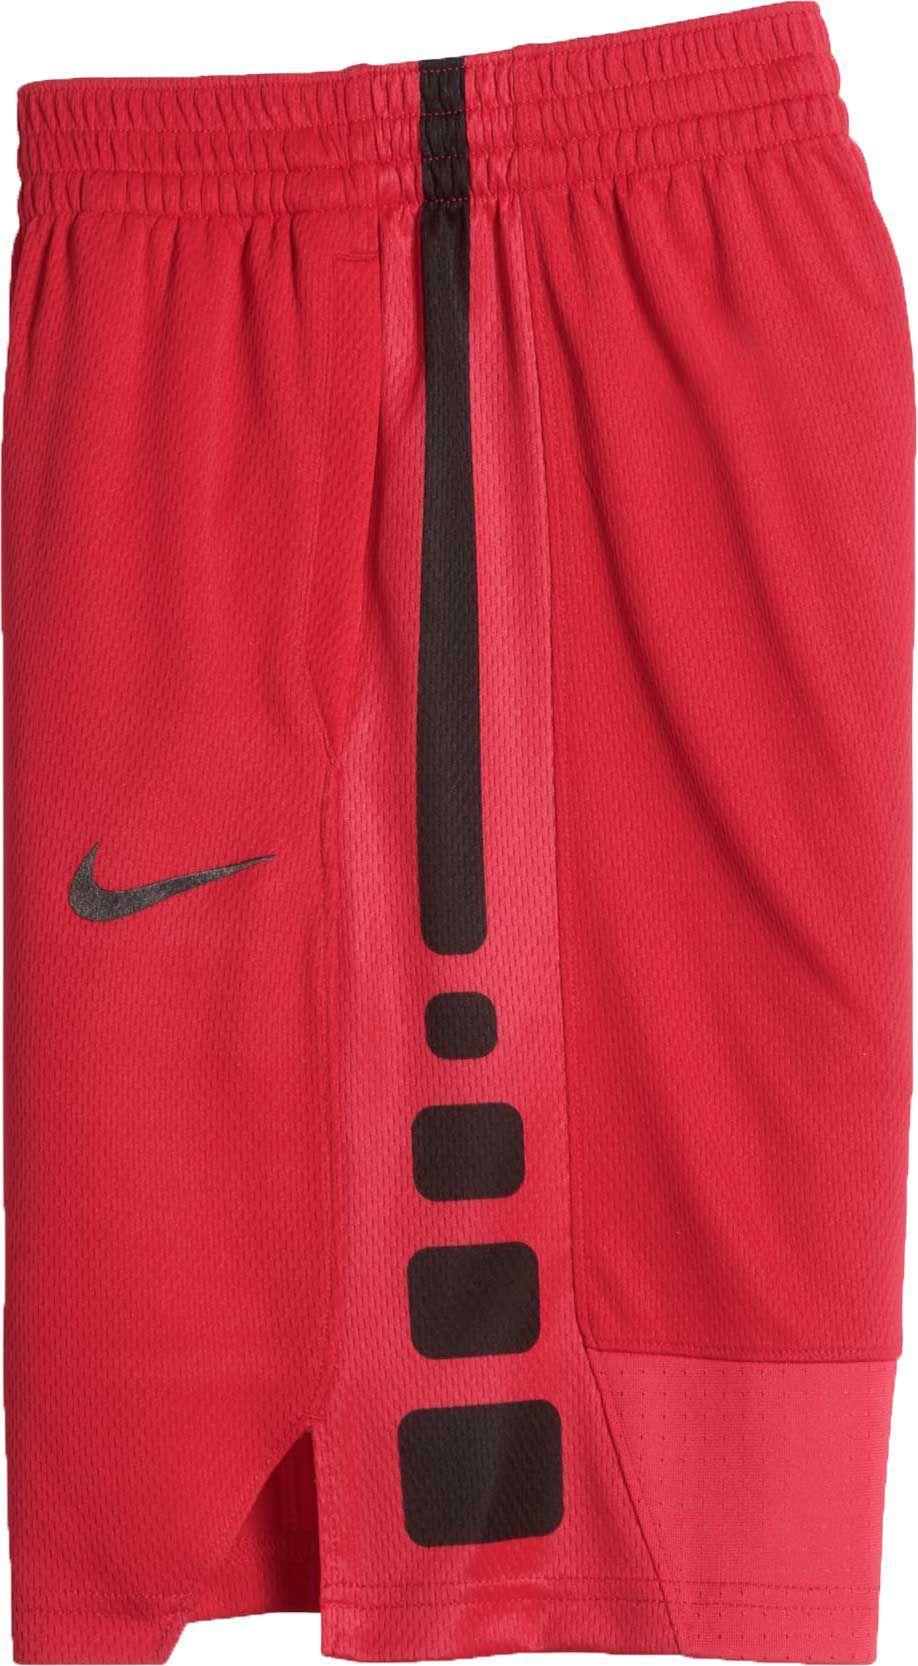 Nike Boys Dry Elite Stripe Basketball Shorts Size Large Red Basketball Shorts Basketball T Shirt Designs Gym Shorts Womens